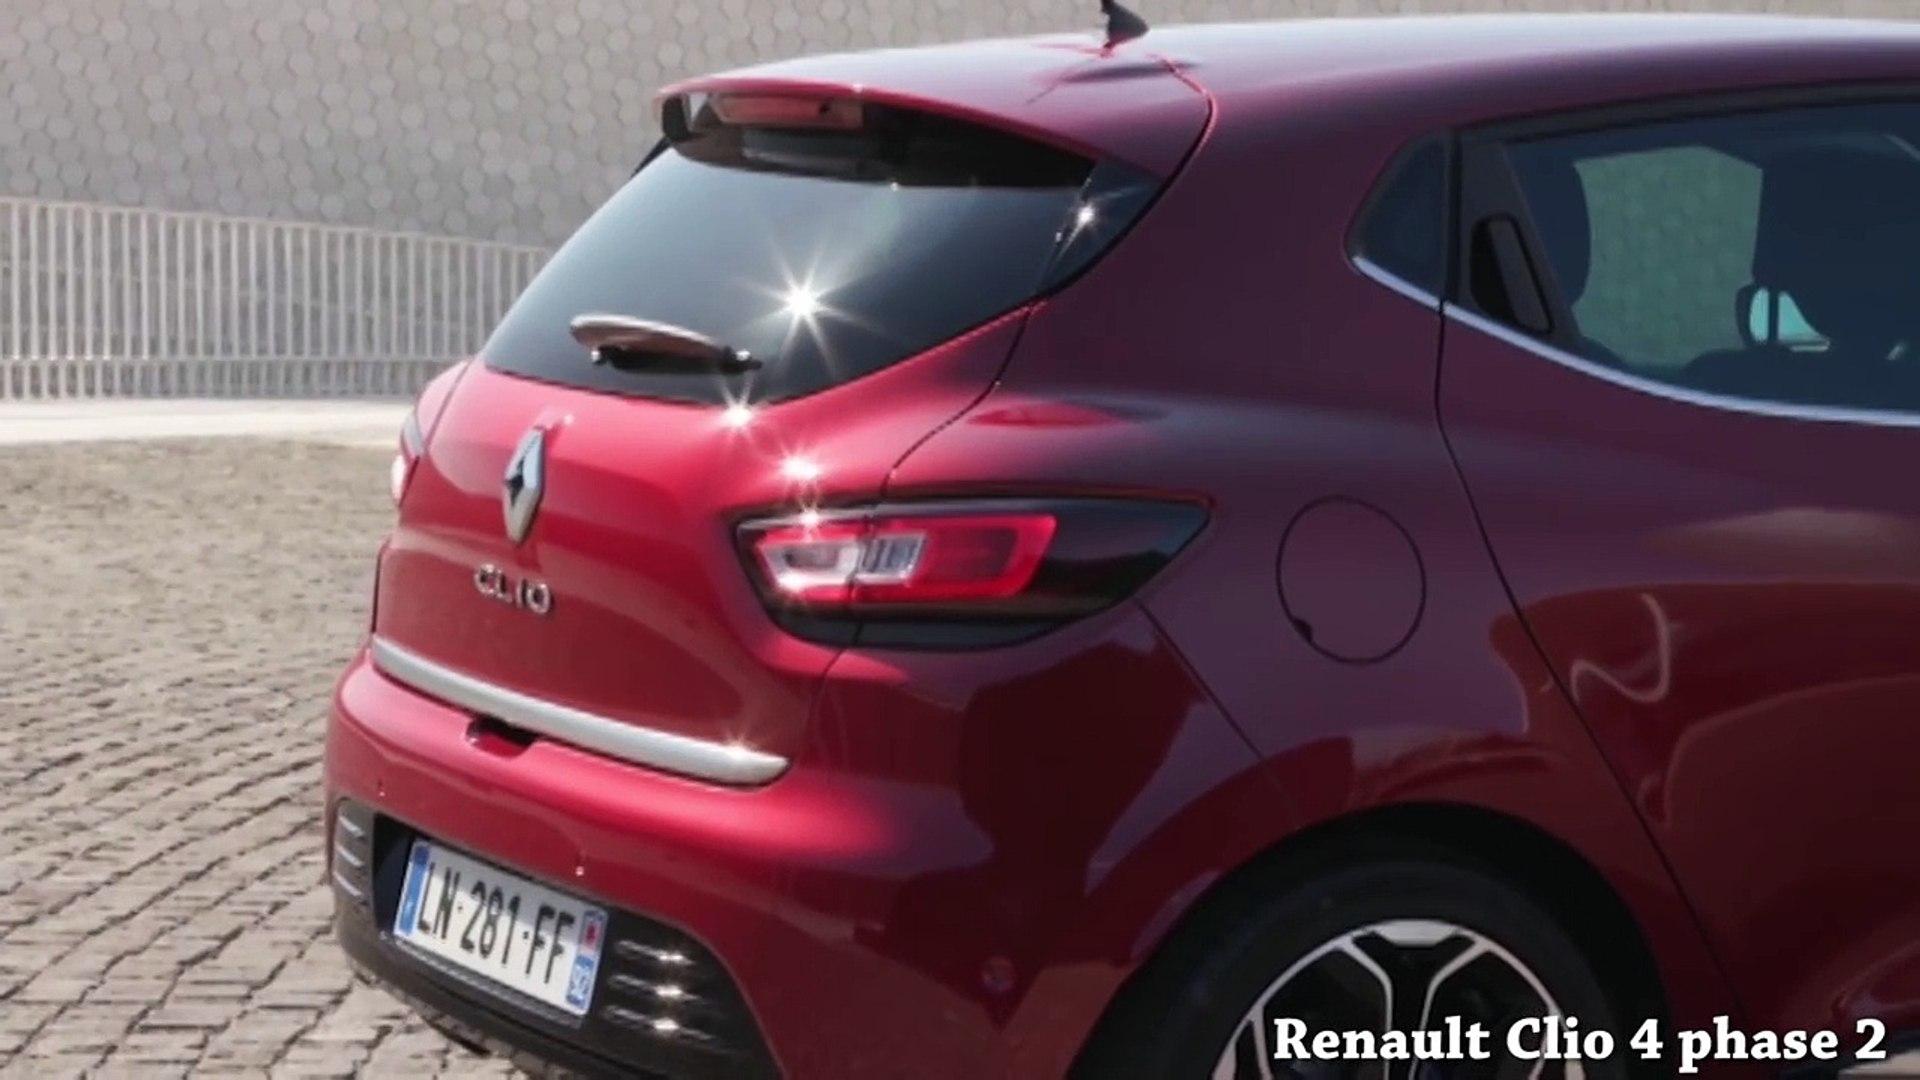 Renault Clio 4 Phase 1 Vs Renault Clio 4 Phase 2